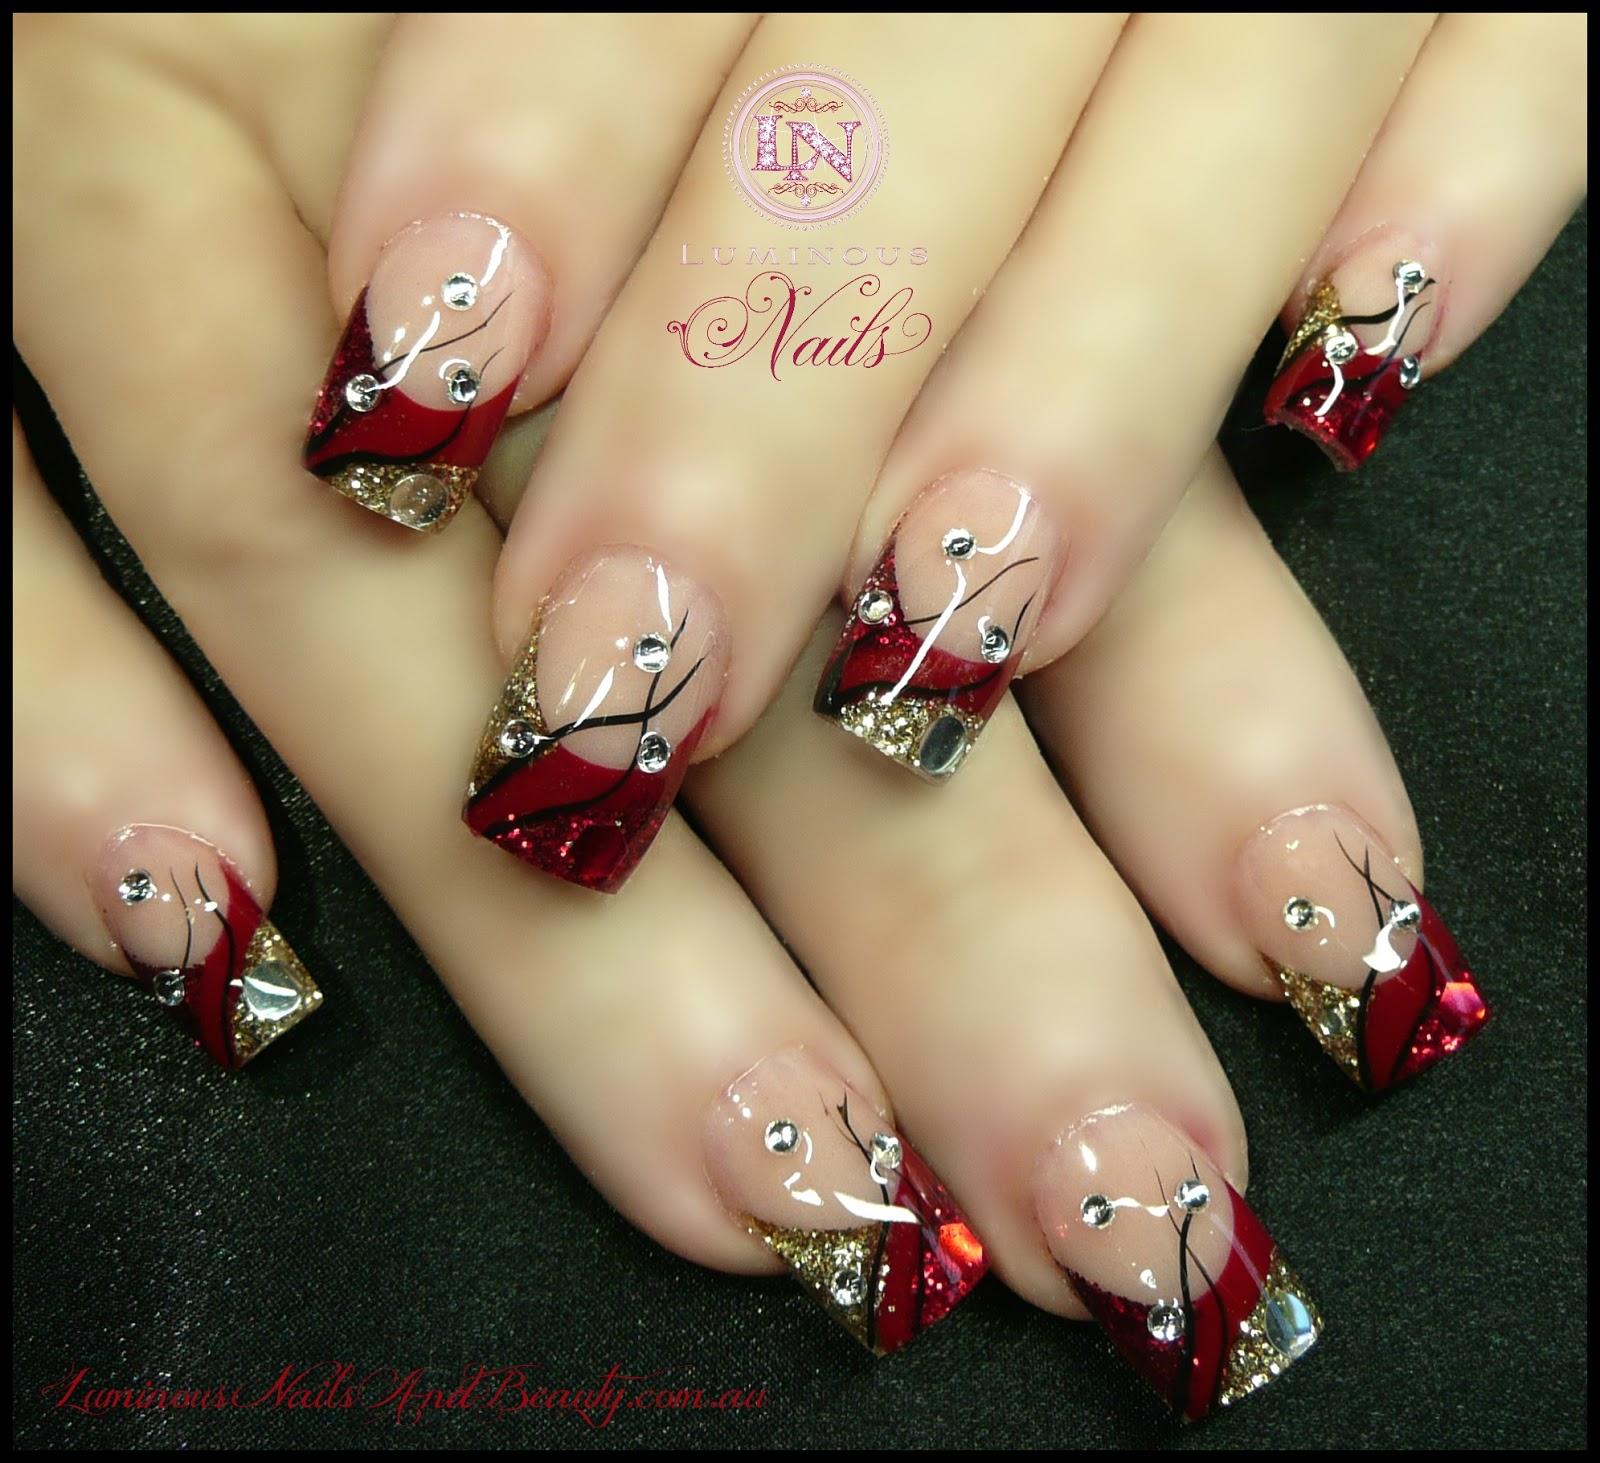 Acrylic Nail Art Designs Gallery: Luminous Nails: December 2012